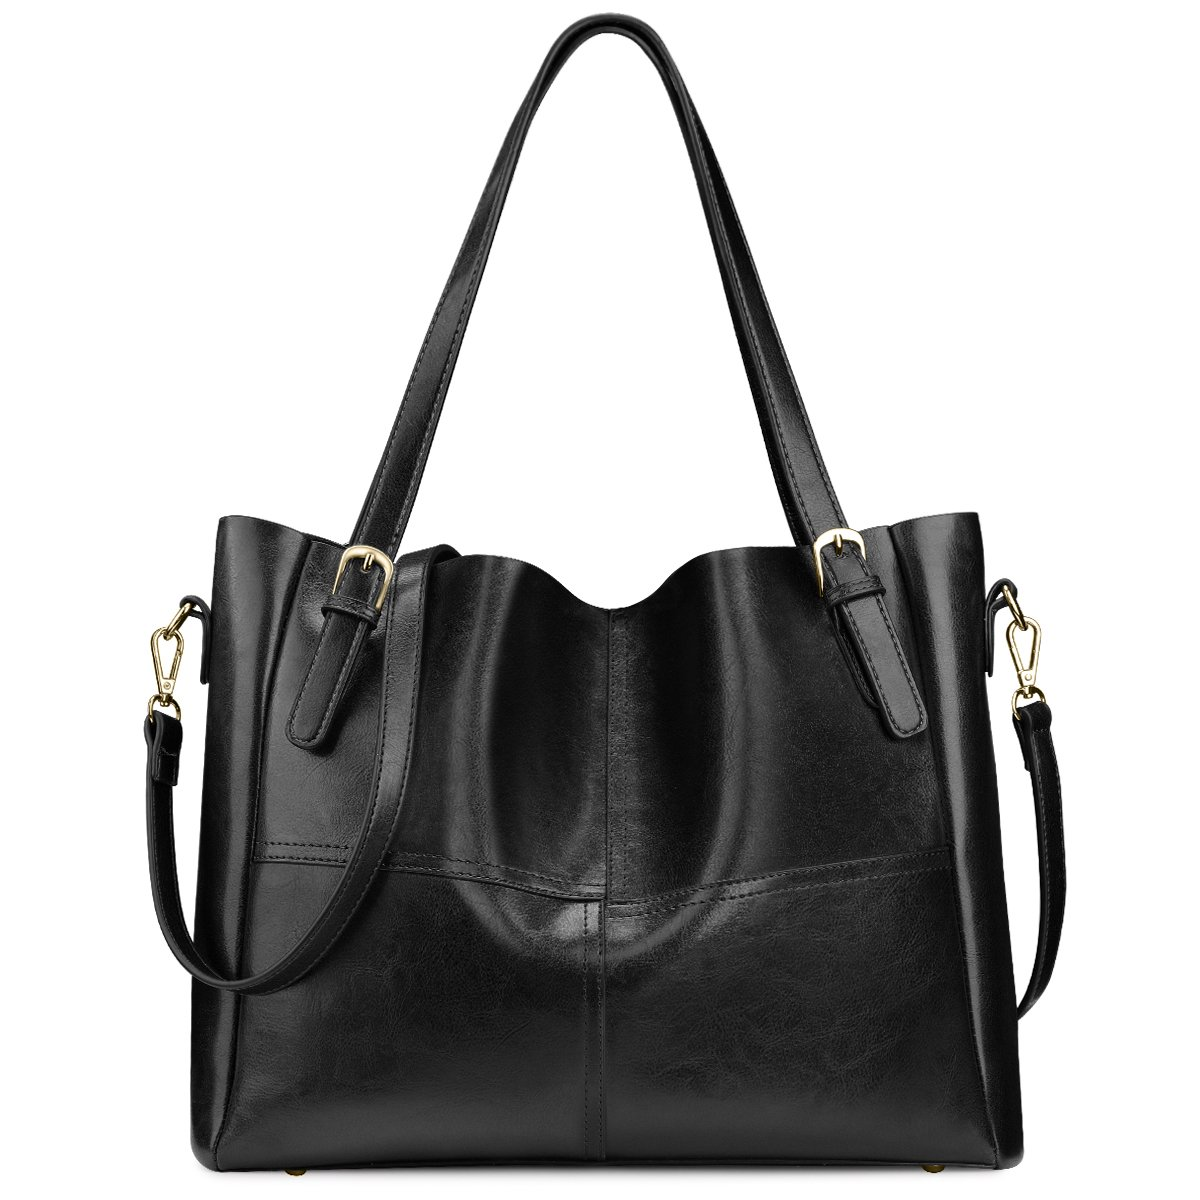 SAMSHOWME Women Top Handle Satchel Handbags Shoulder Bag PU Leather Tote Purse (Black)